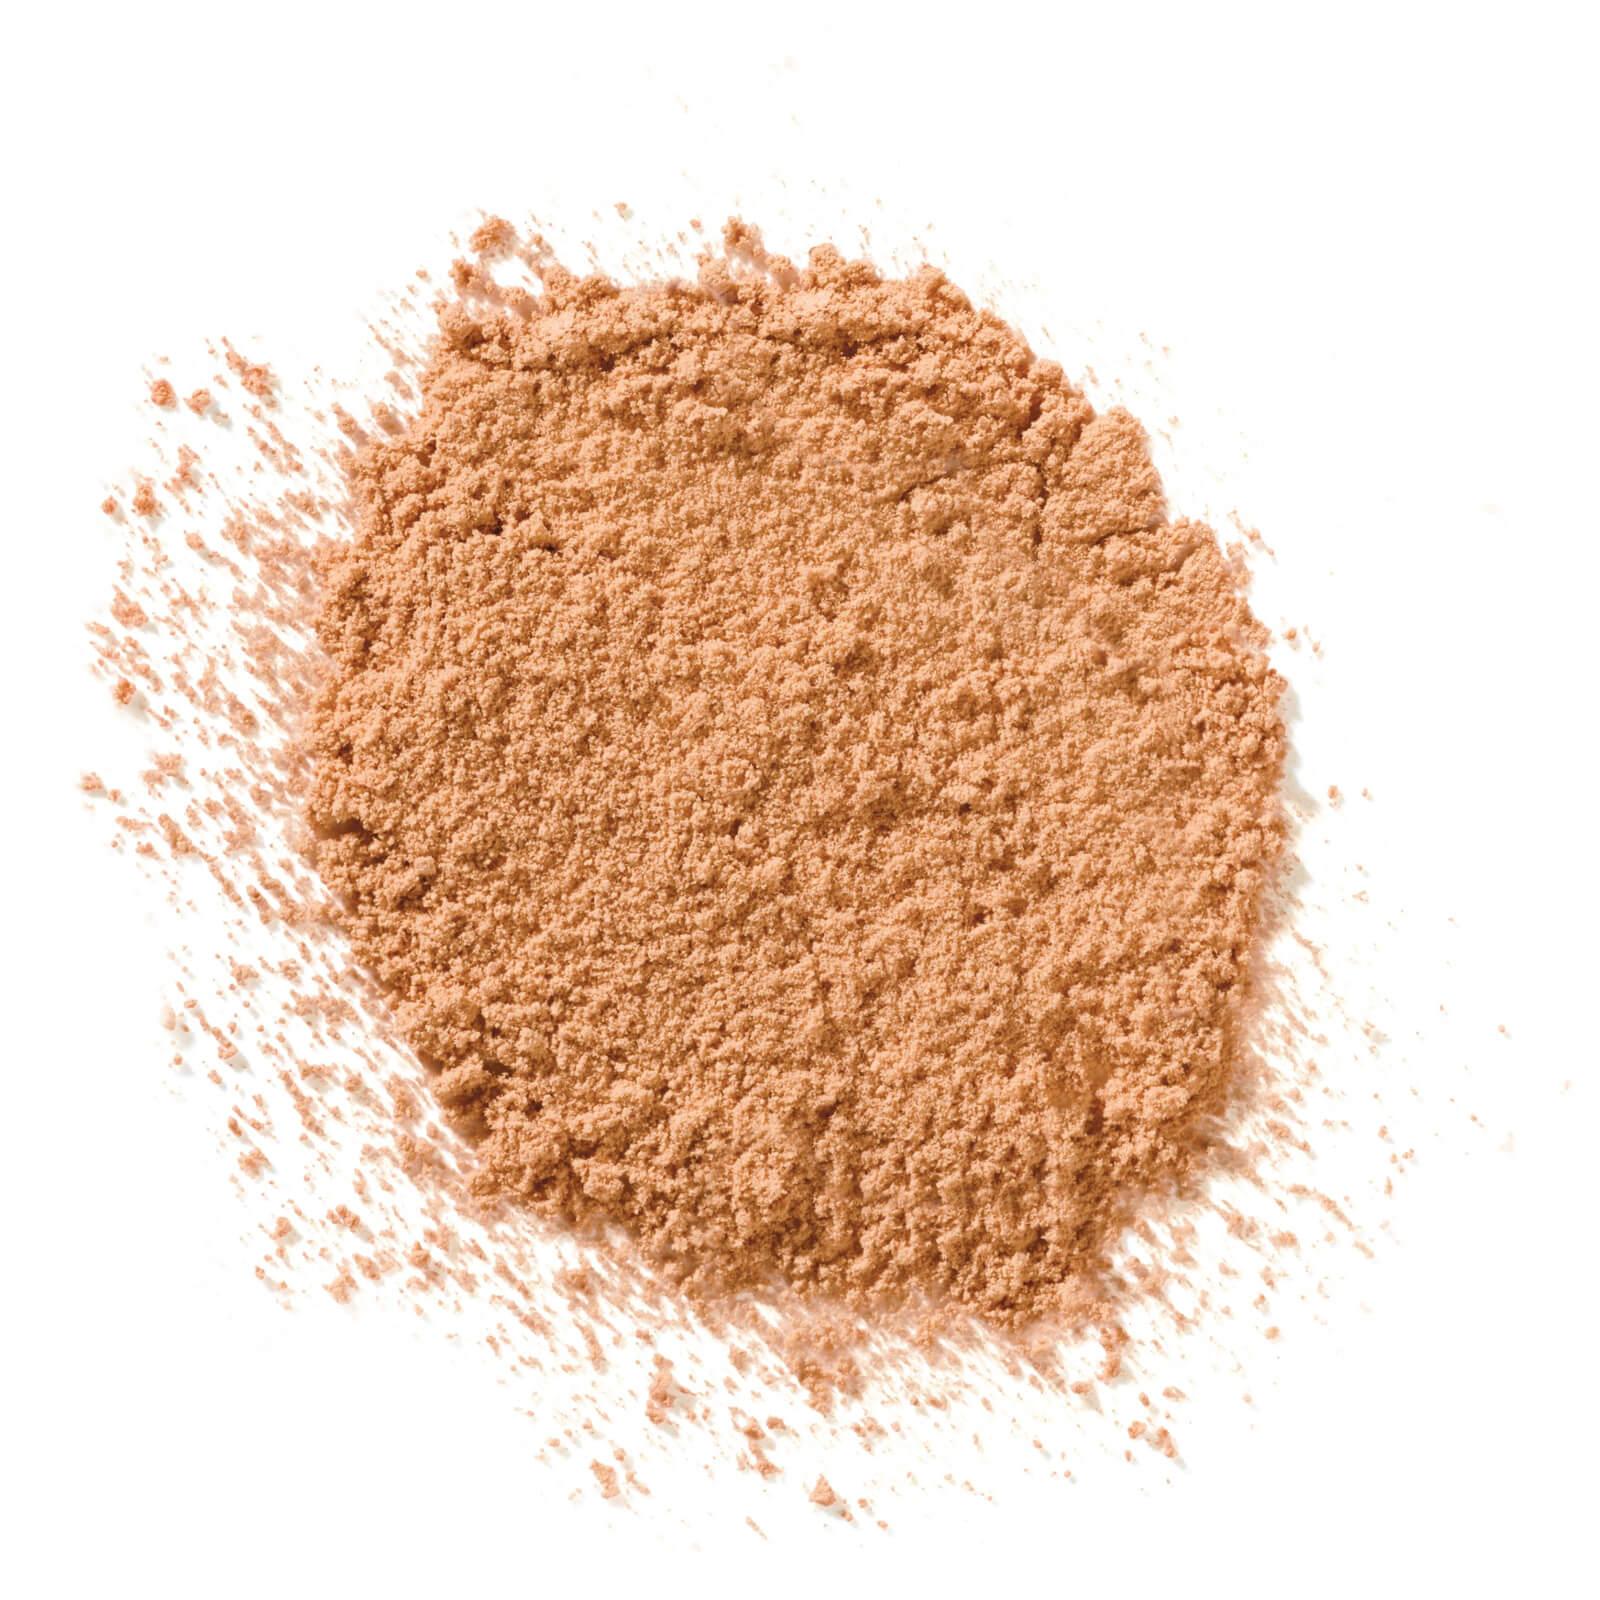 Elisabeth Arden High Performance Blurring Loose Powder 17.5g (Various Shades) - Medium Deep 04